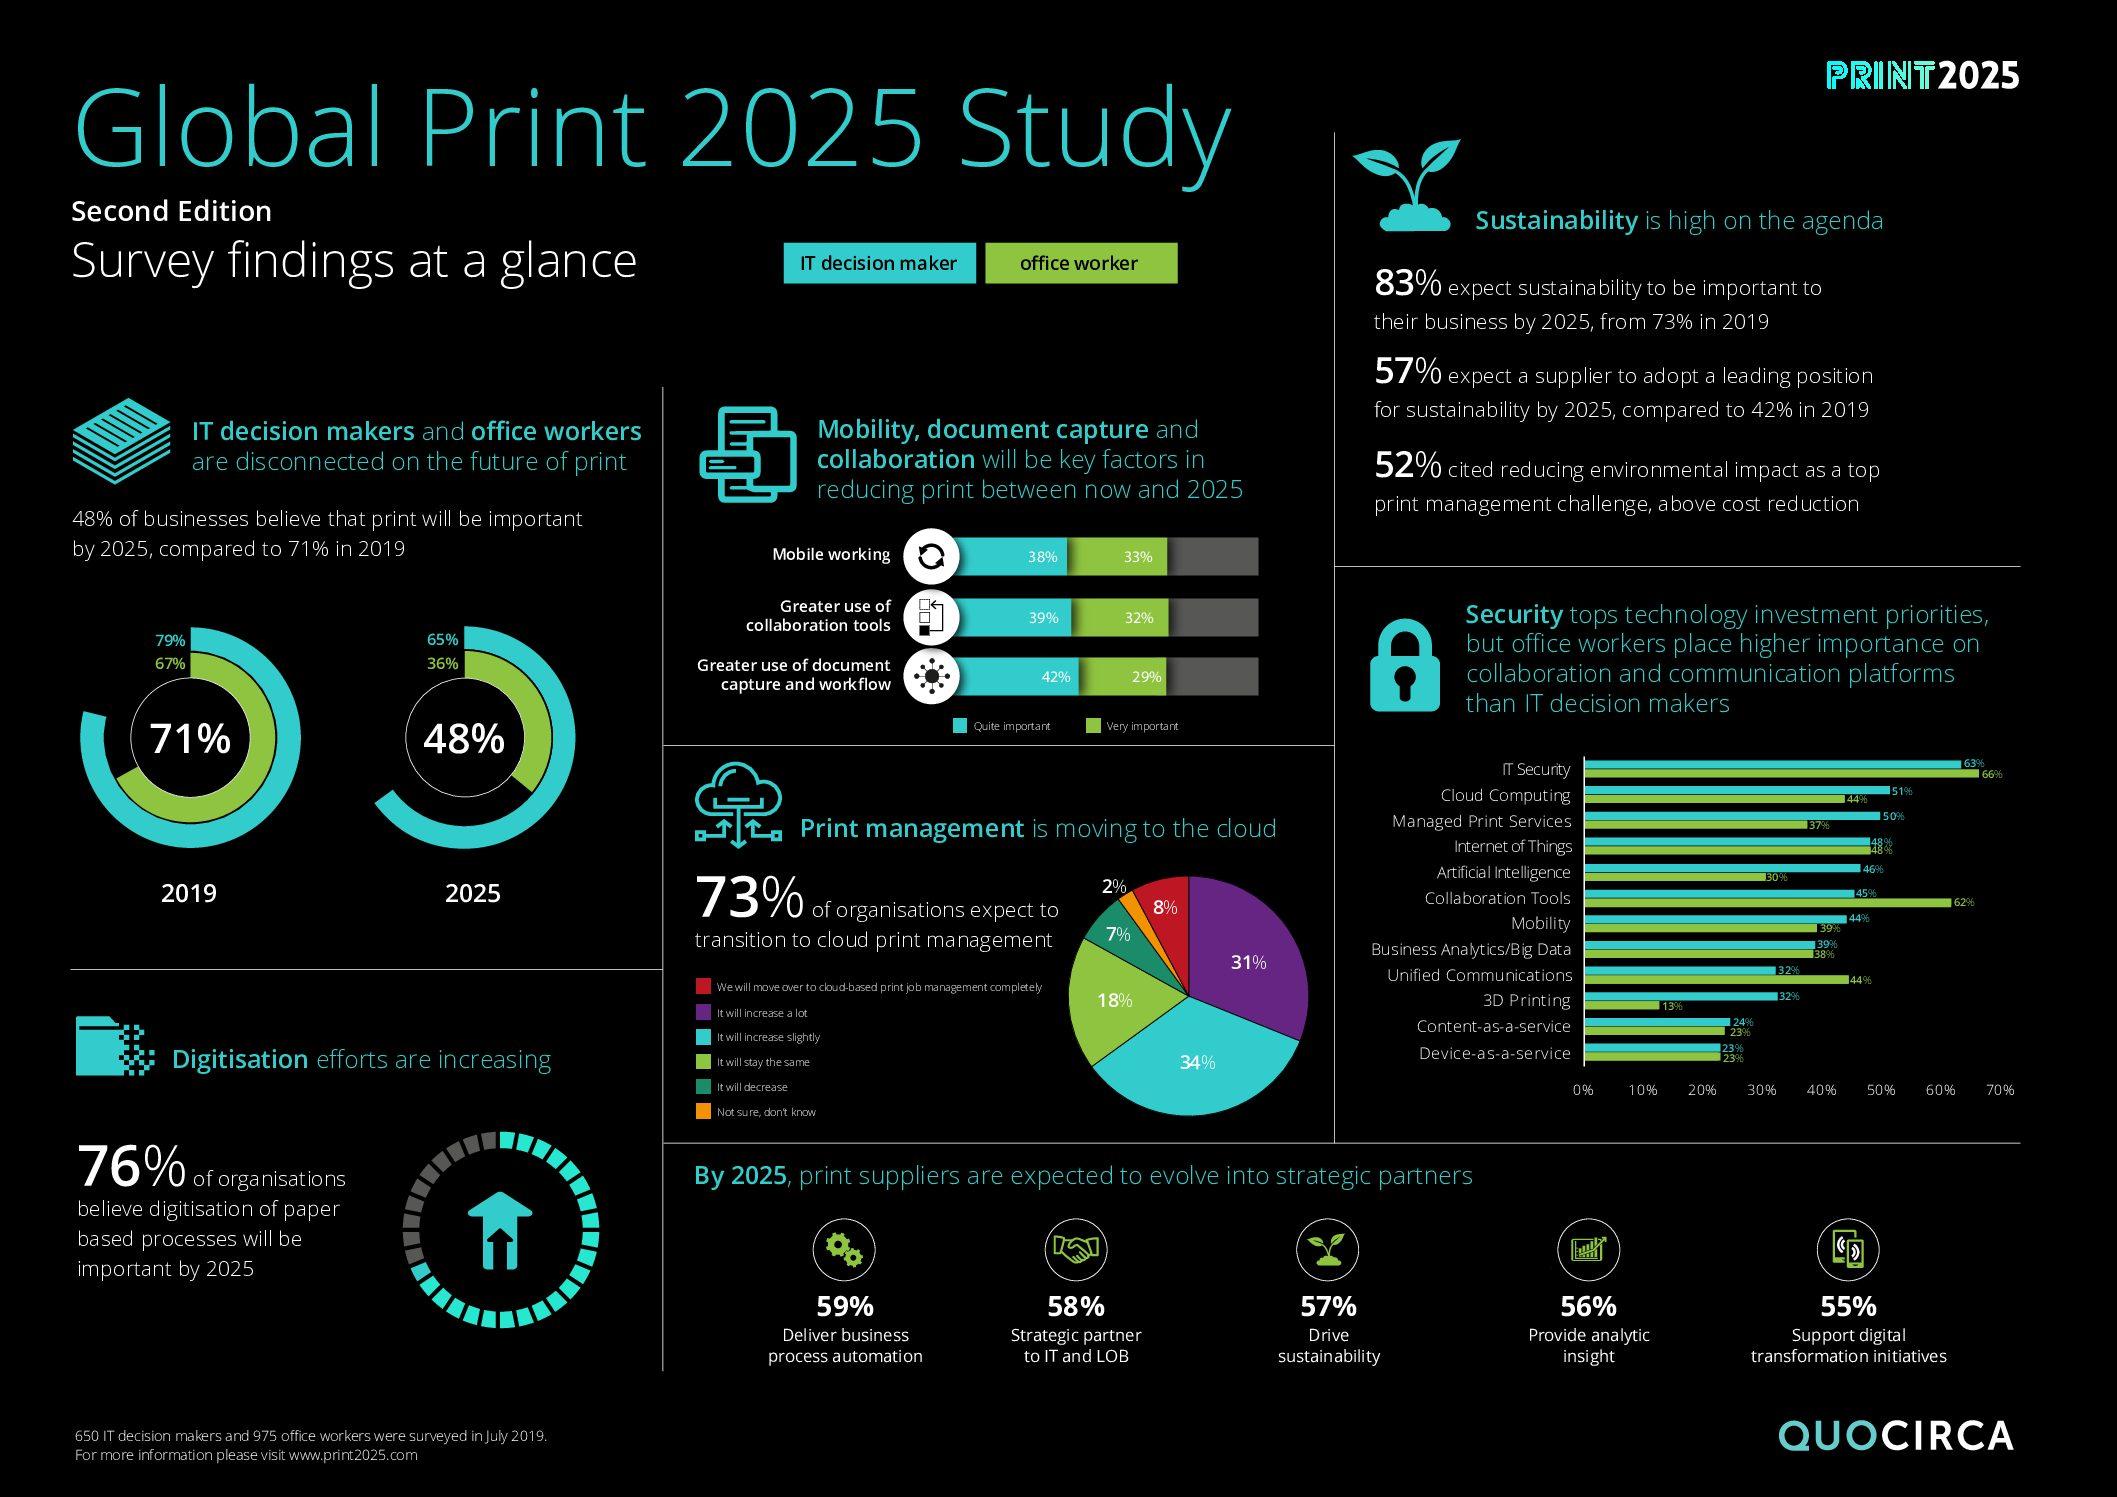 Infographic: Global Print 2025 Study 2nd Edition